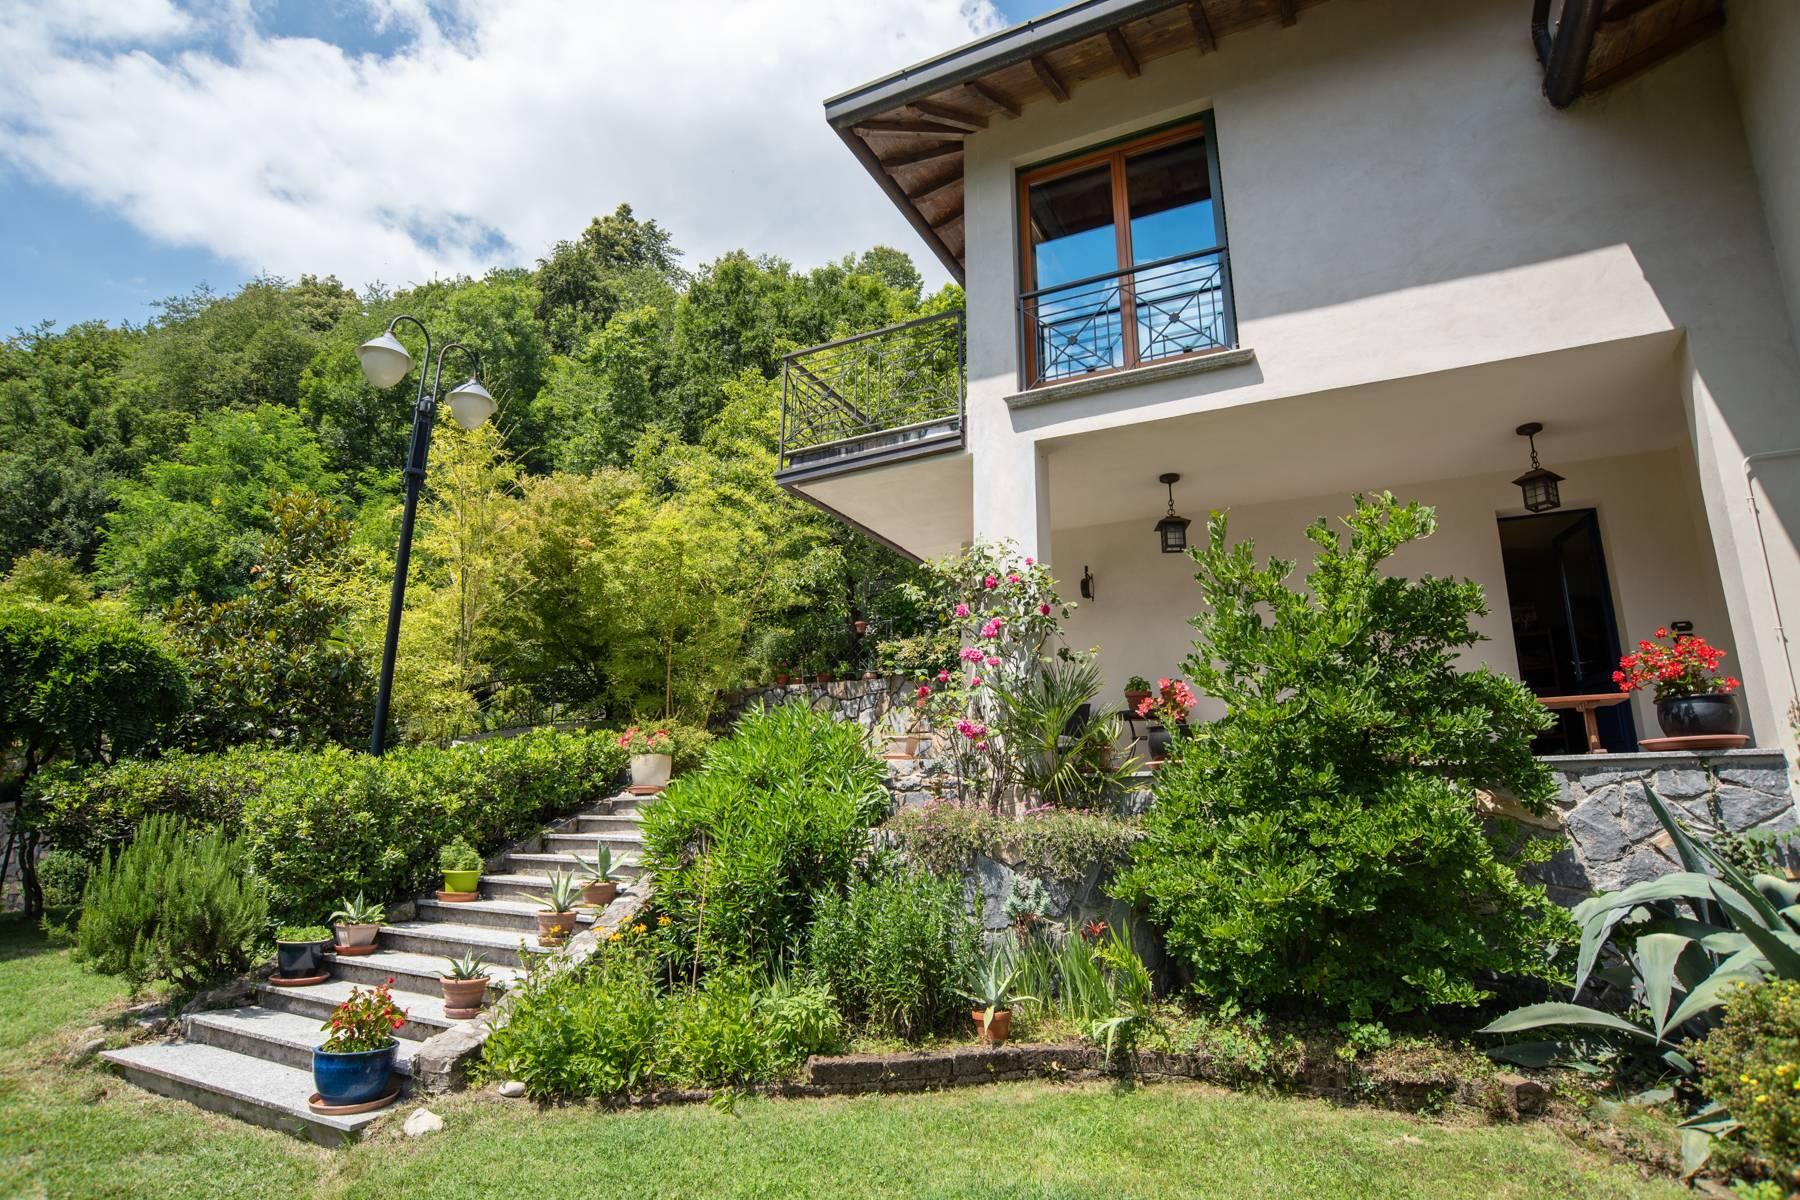 Splendida villa moderna sulla collina soleggiata sopra Argegno - 7